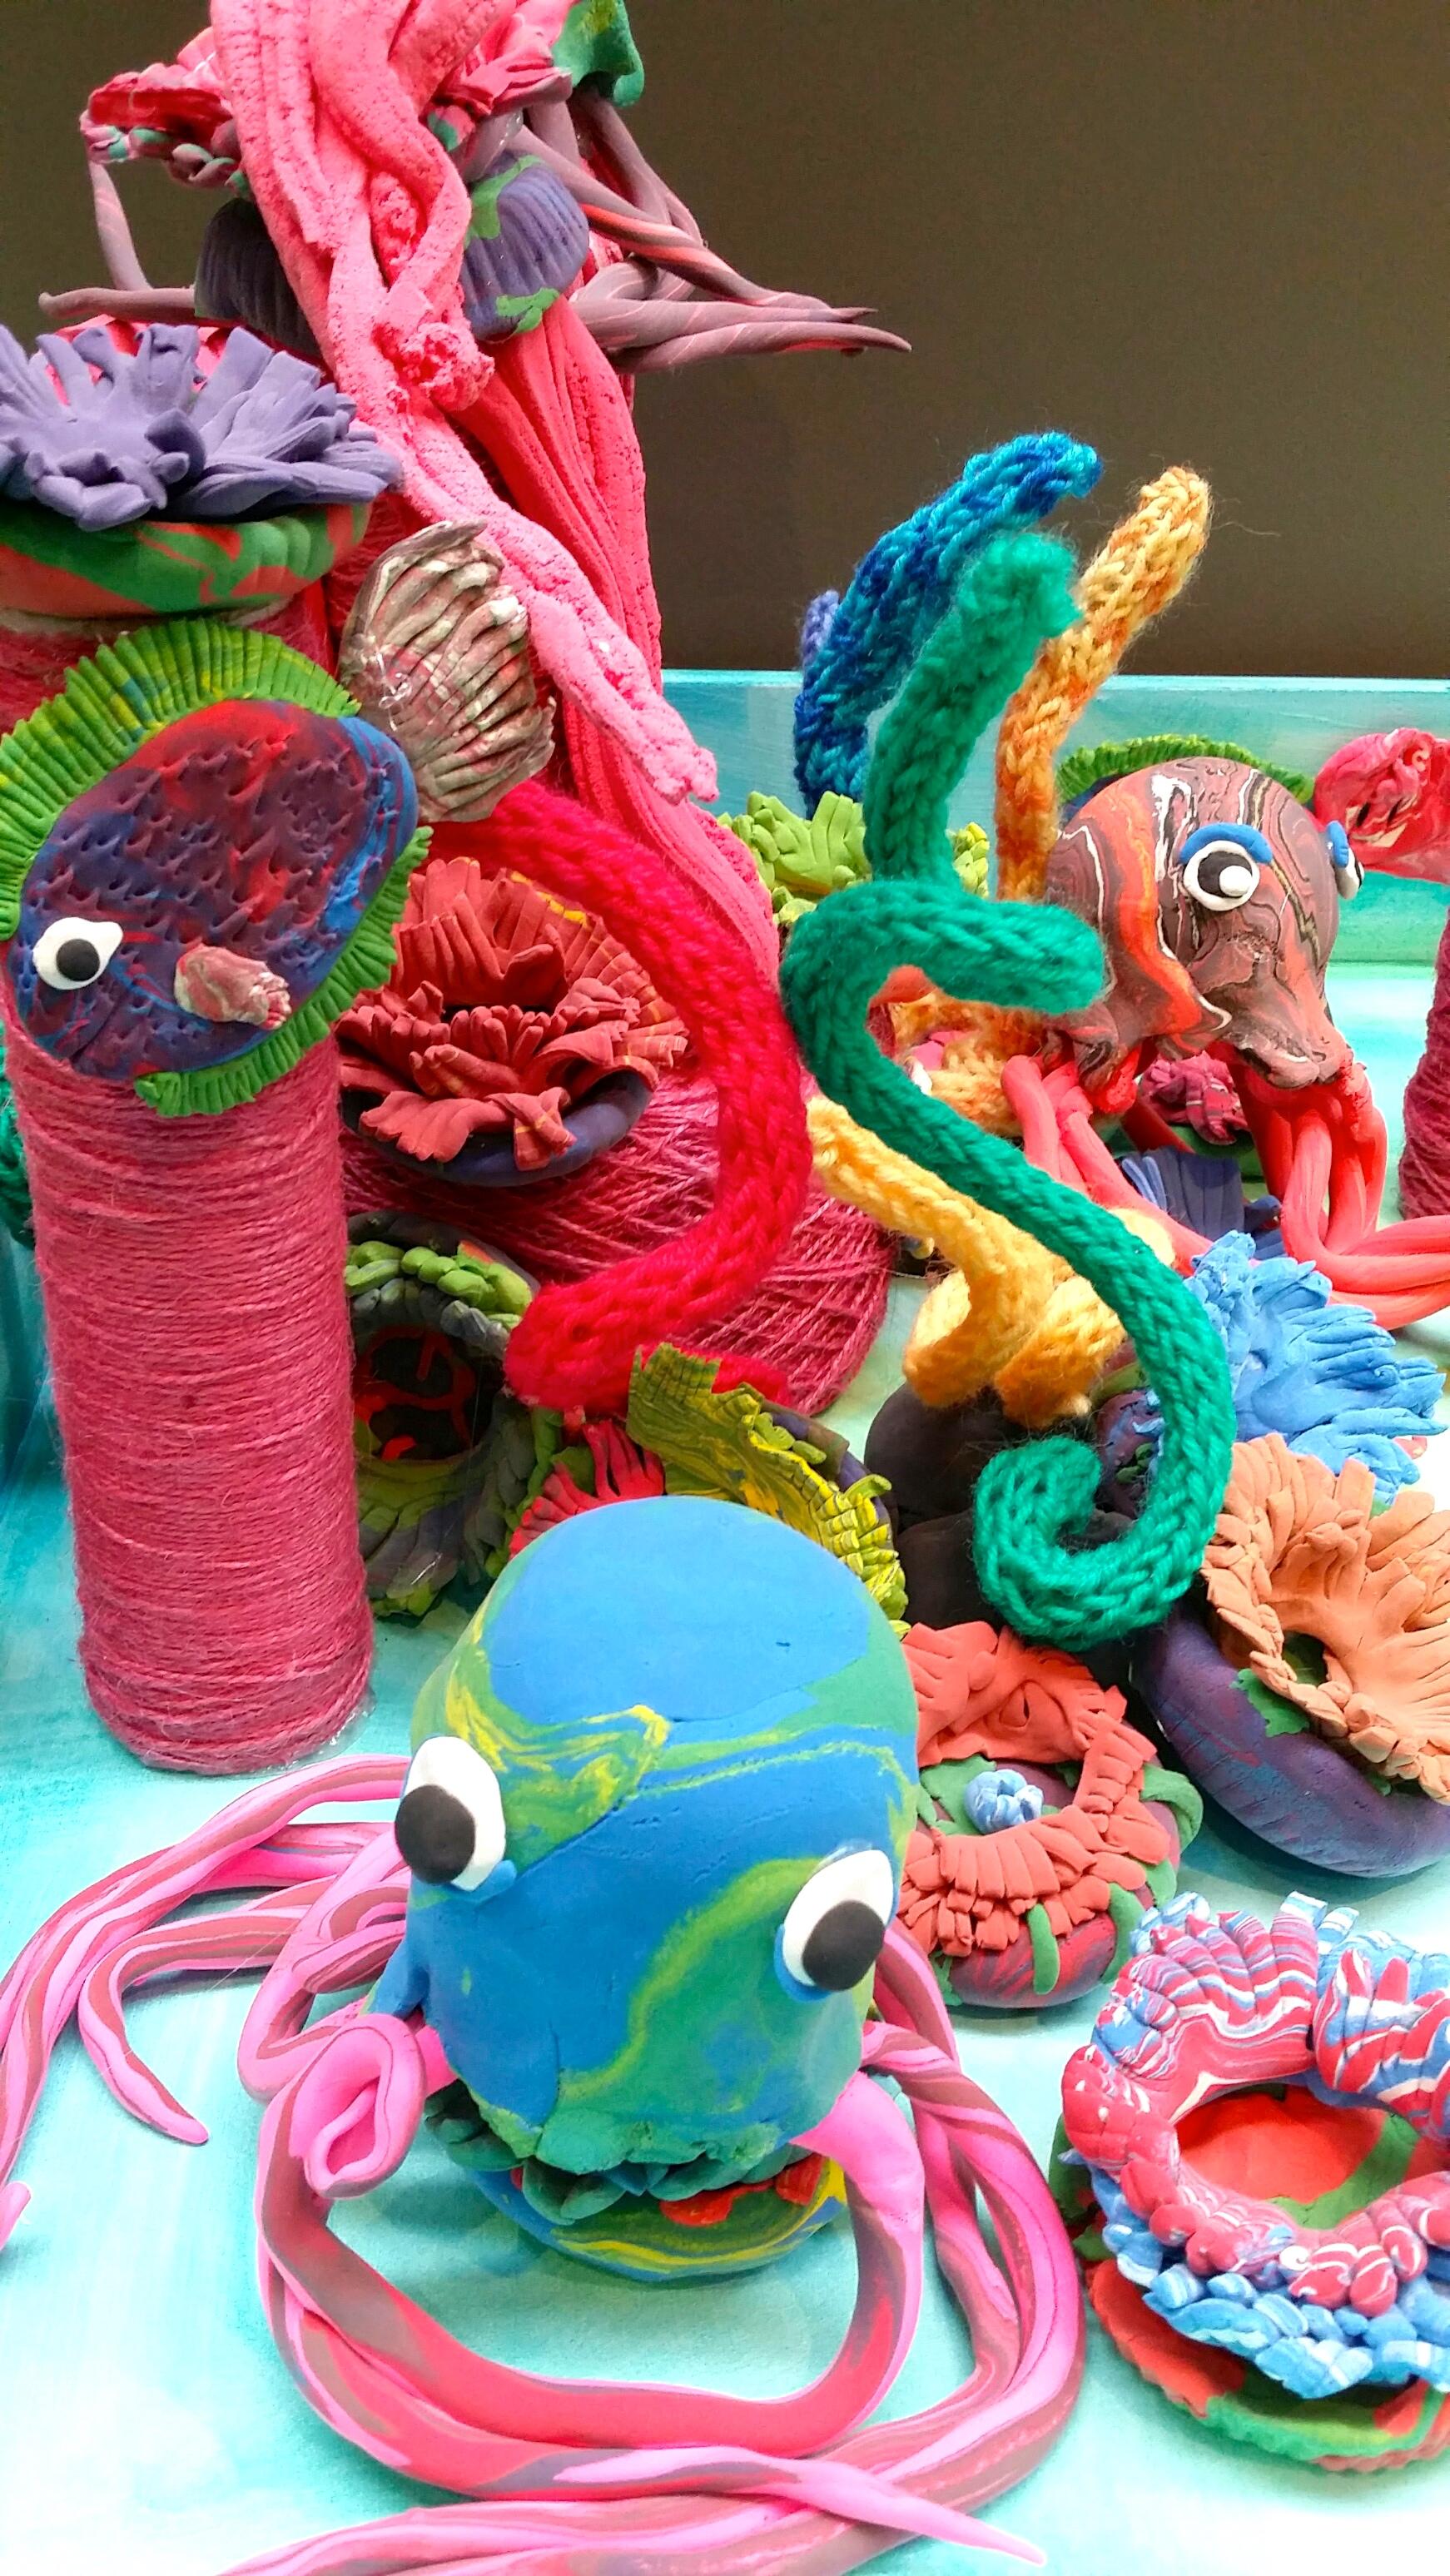 Octopus' Garden 2